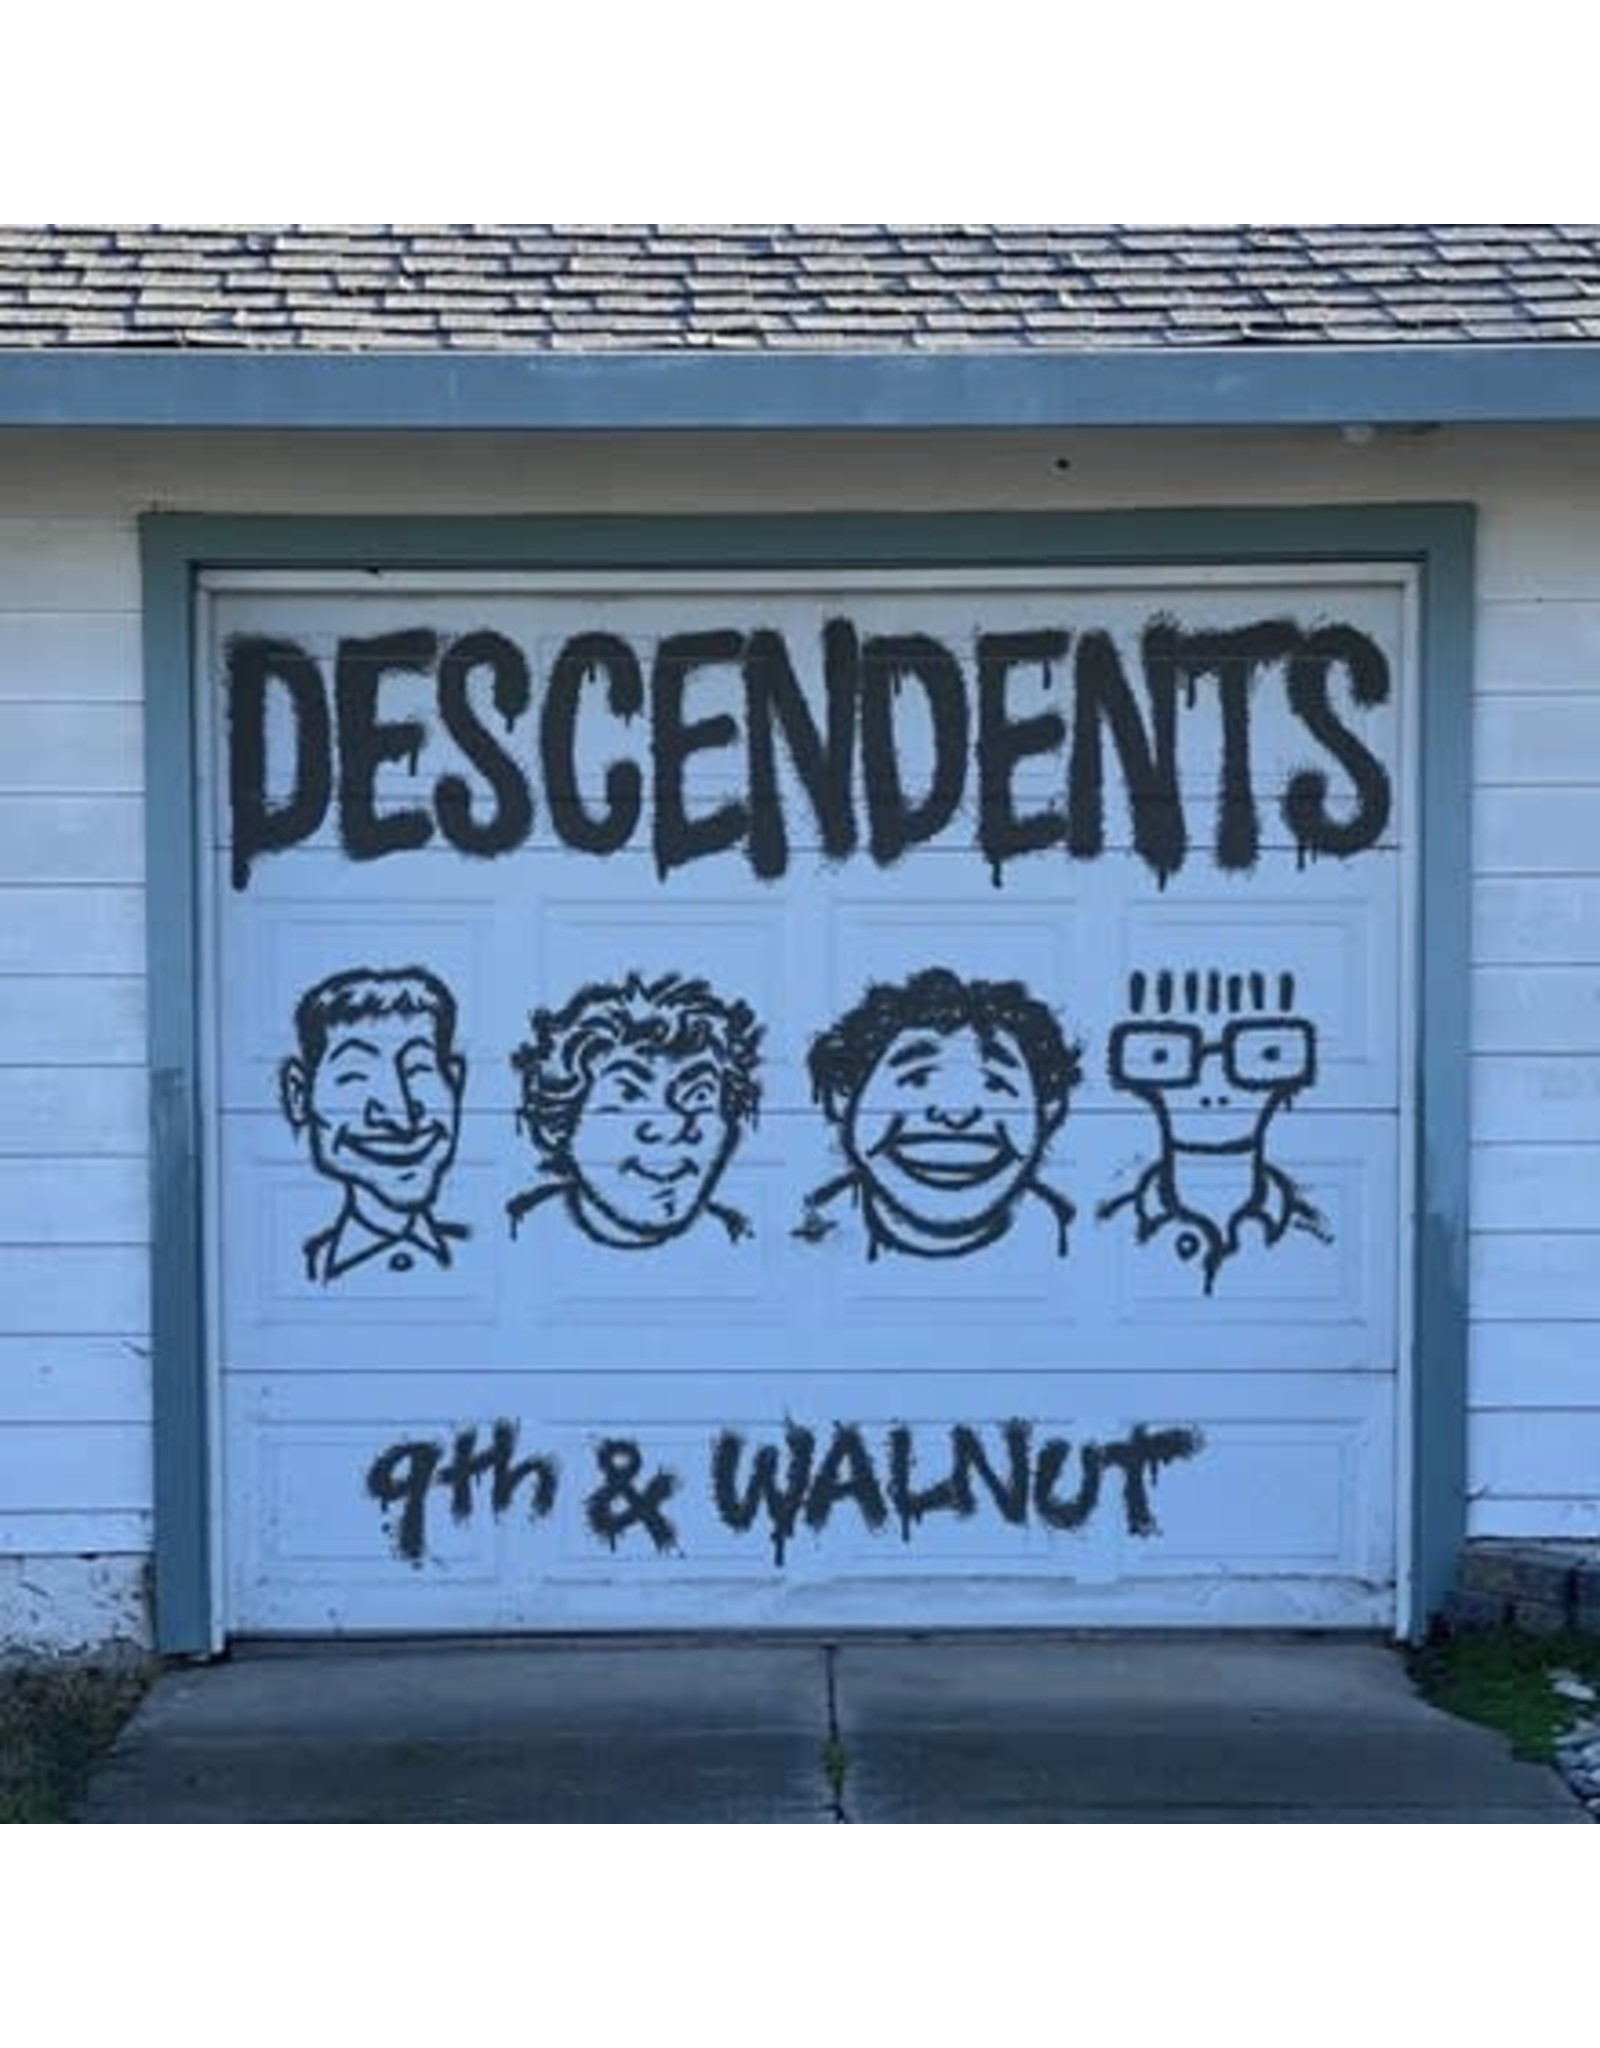 Epitaph Descendents: 9th & Walnut LP